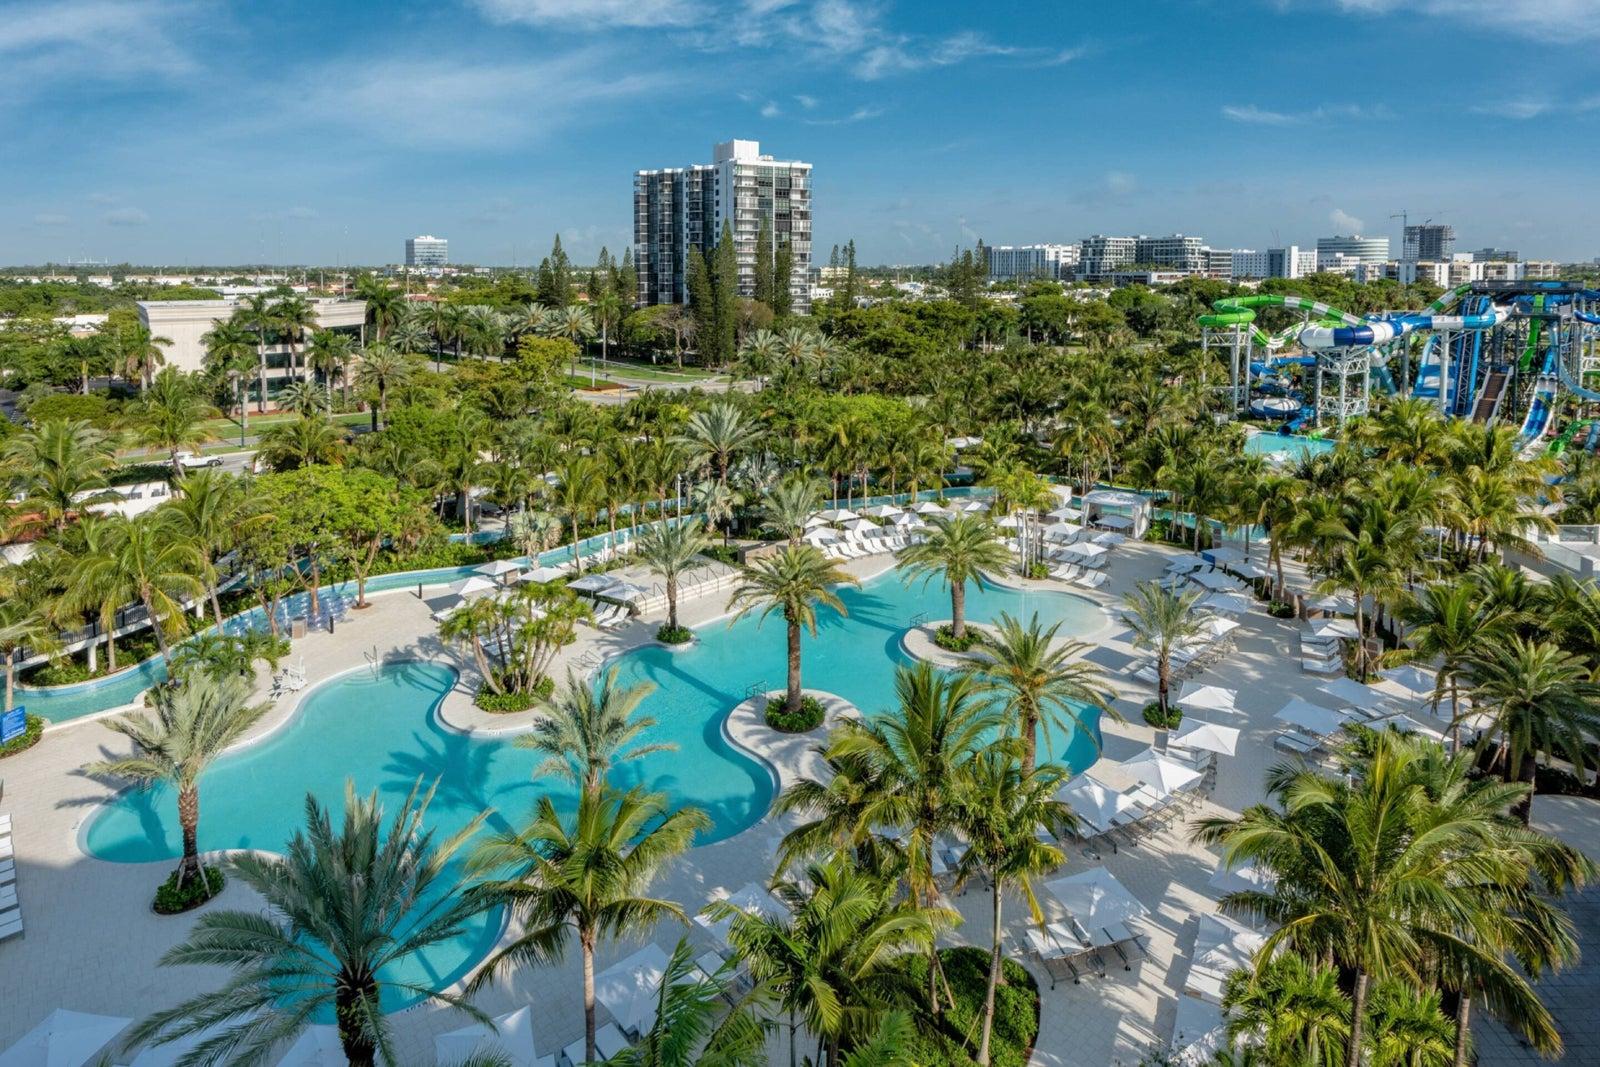 The JW Marriott Miami Turnberry Resort & Spa. (Photo courtesy of Marriott)